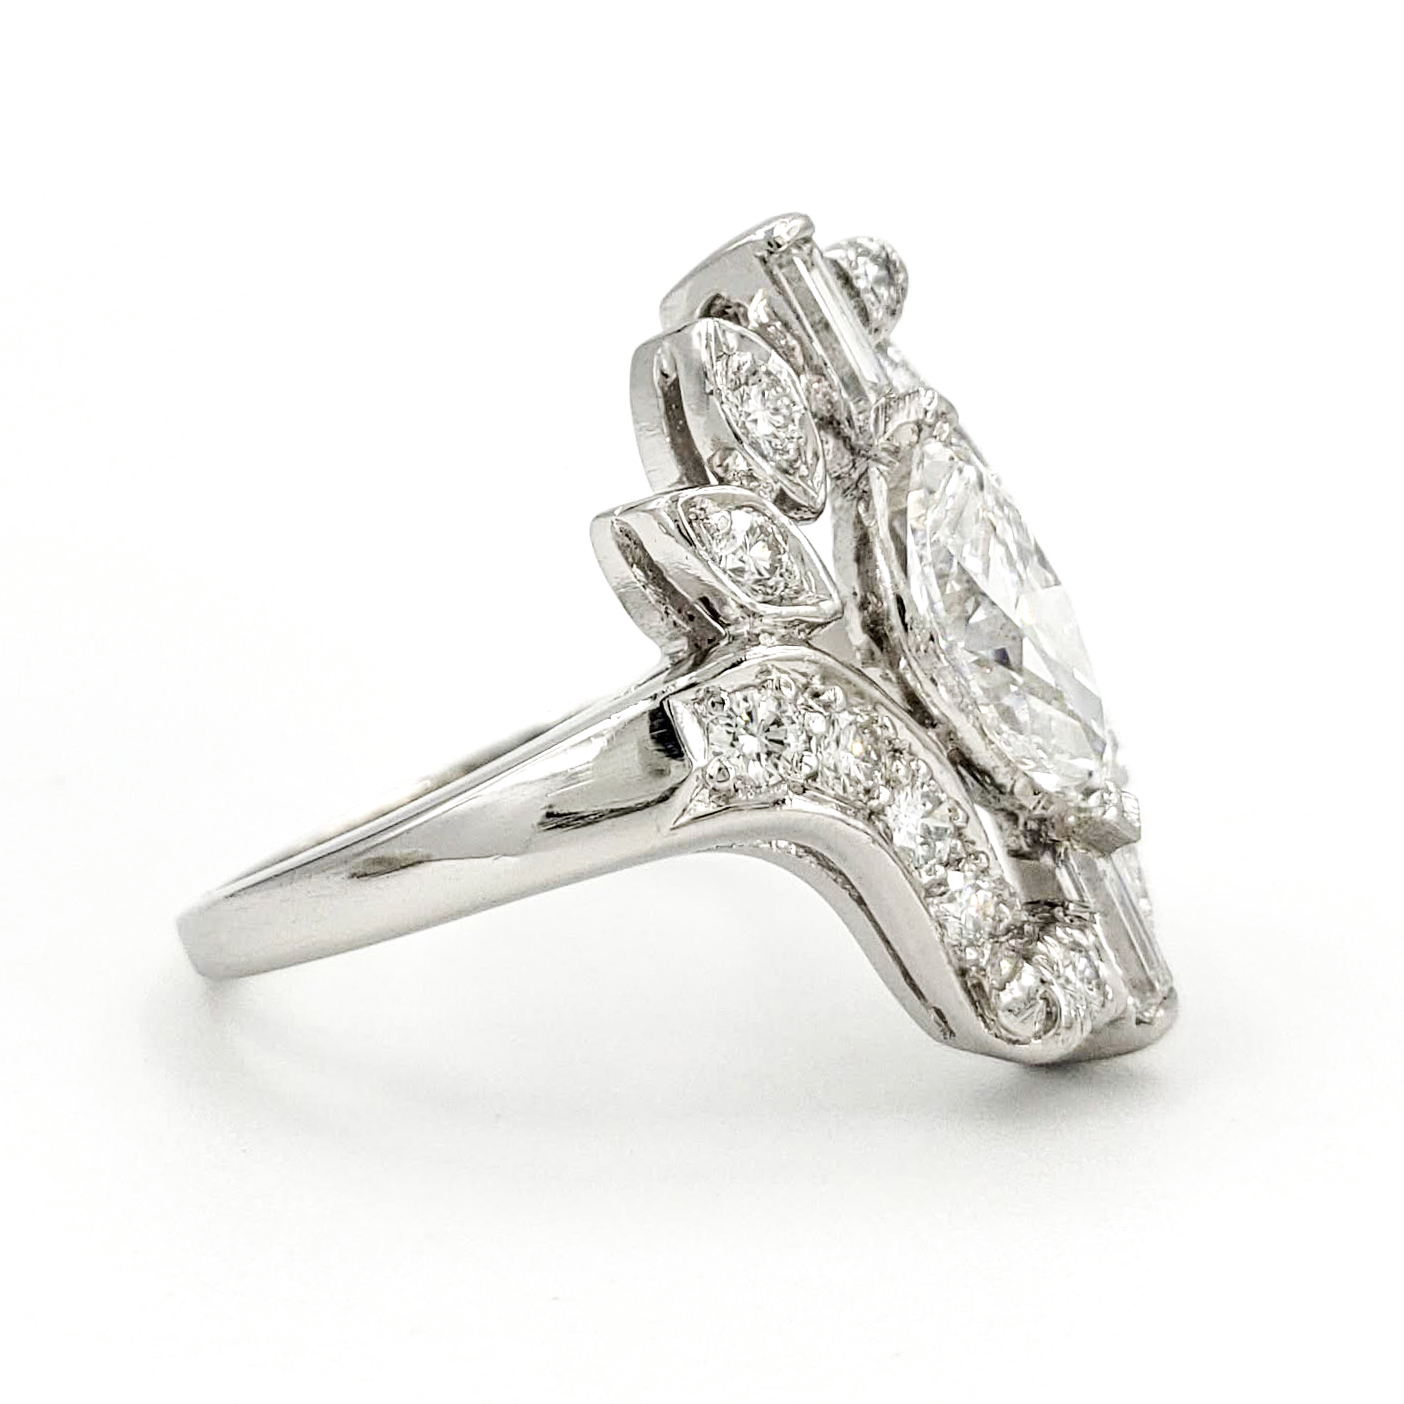 vintage-platinum-engagement-ring-with-0-76-carat-marquise-cut-diamond-egl-d-vs1